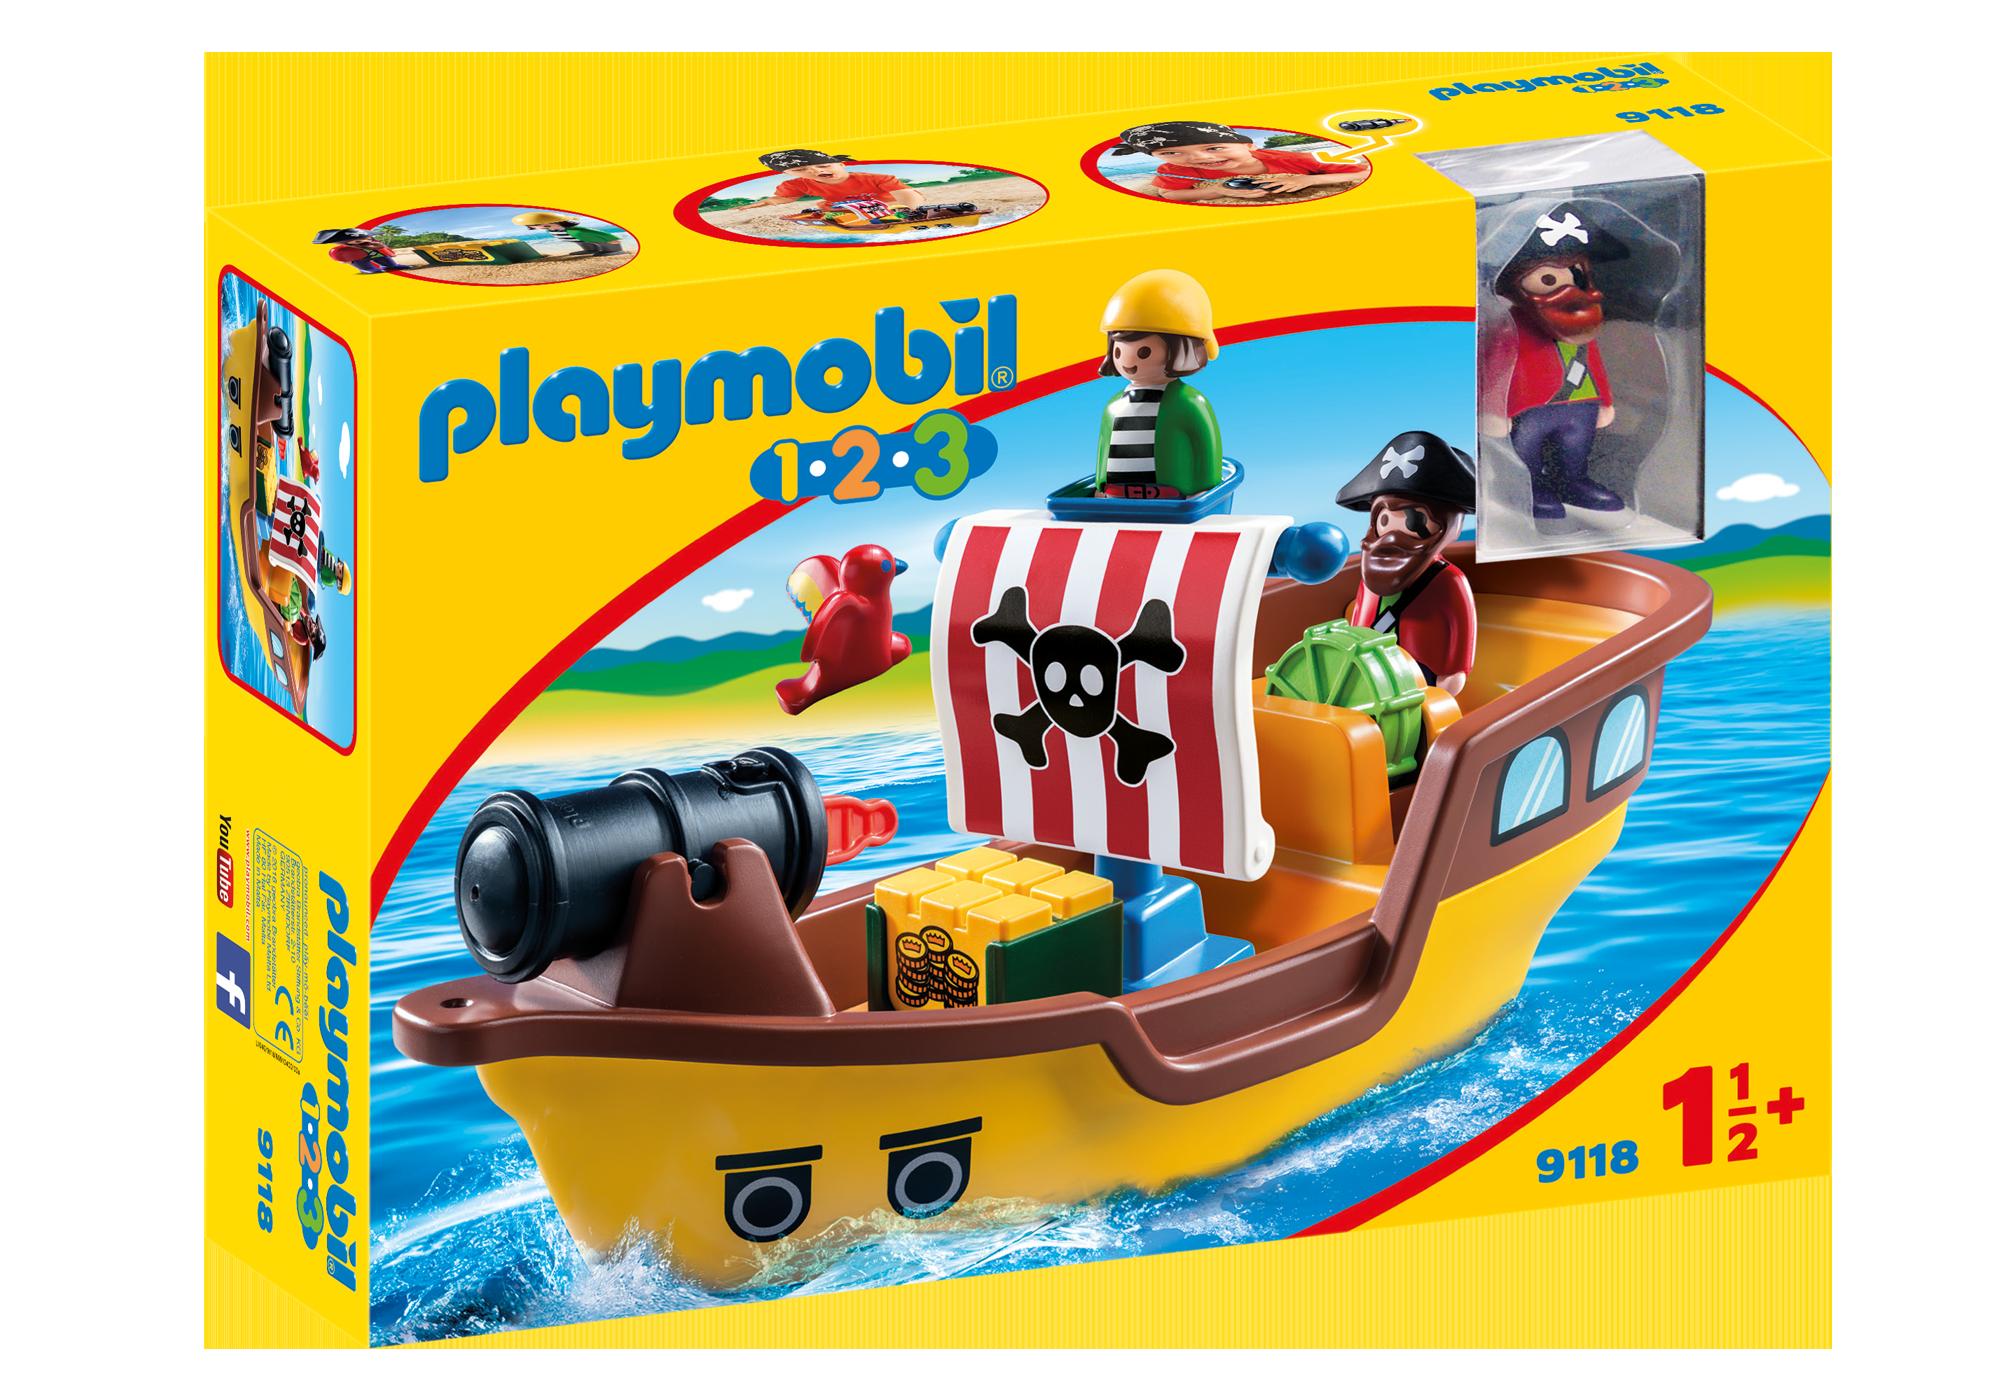 http://media.playmobil.com/i/playmobil/9118_product_box_front/Pirate Ship